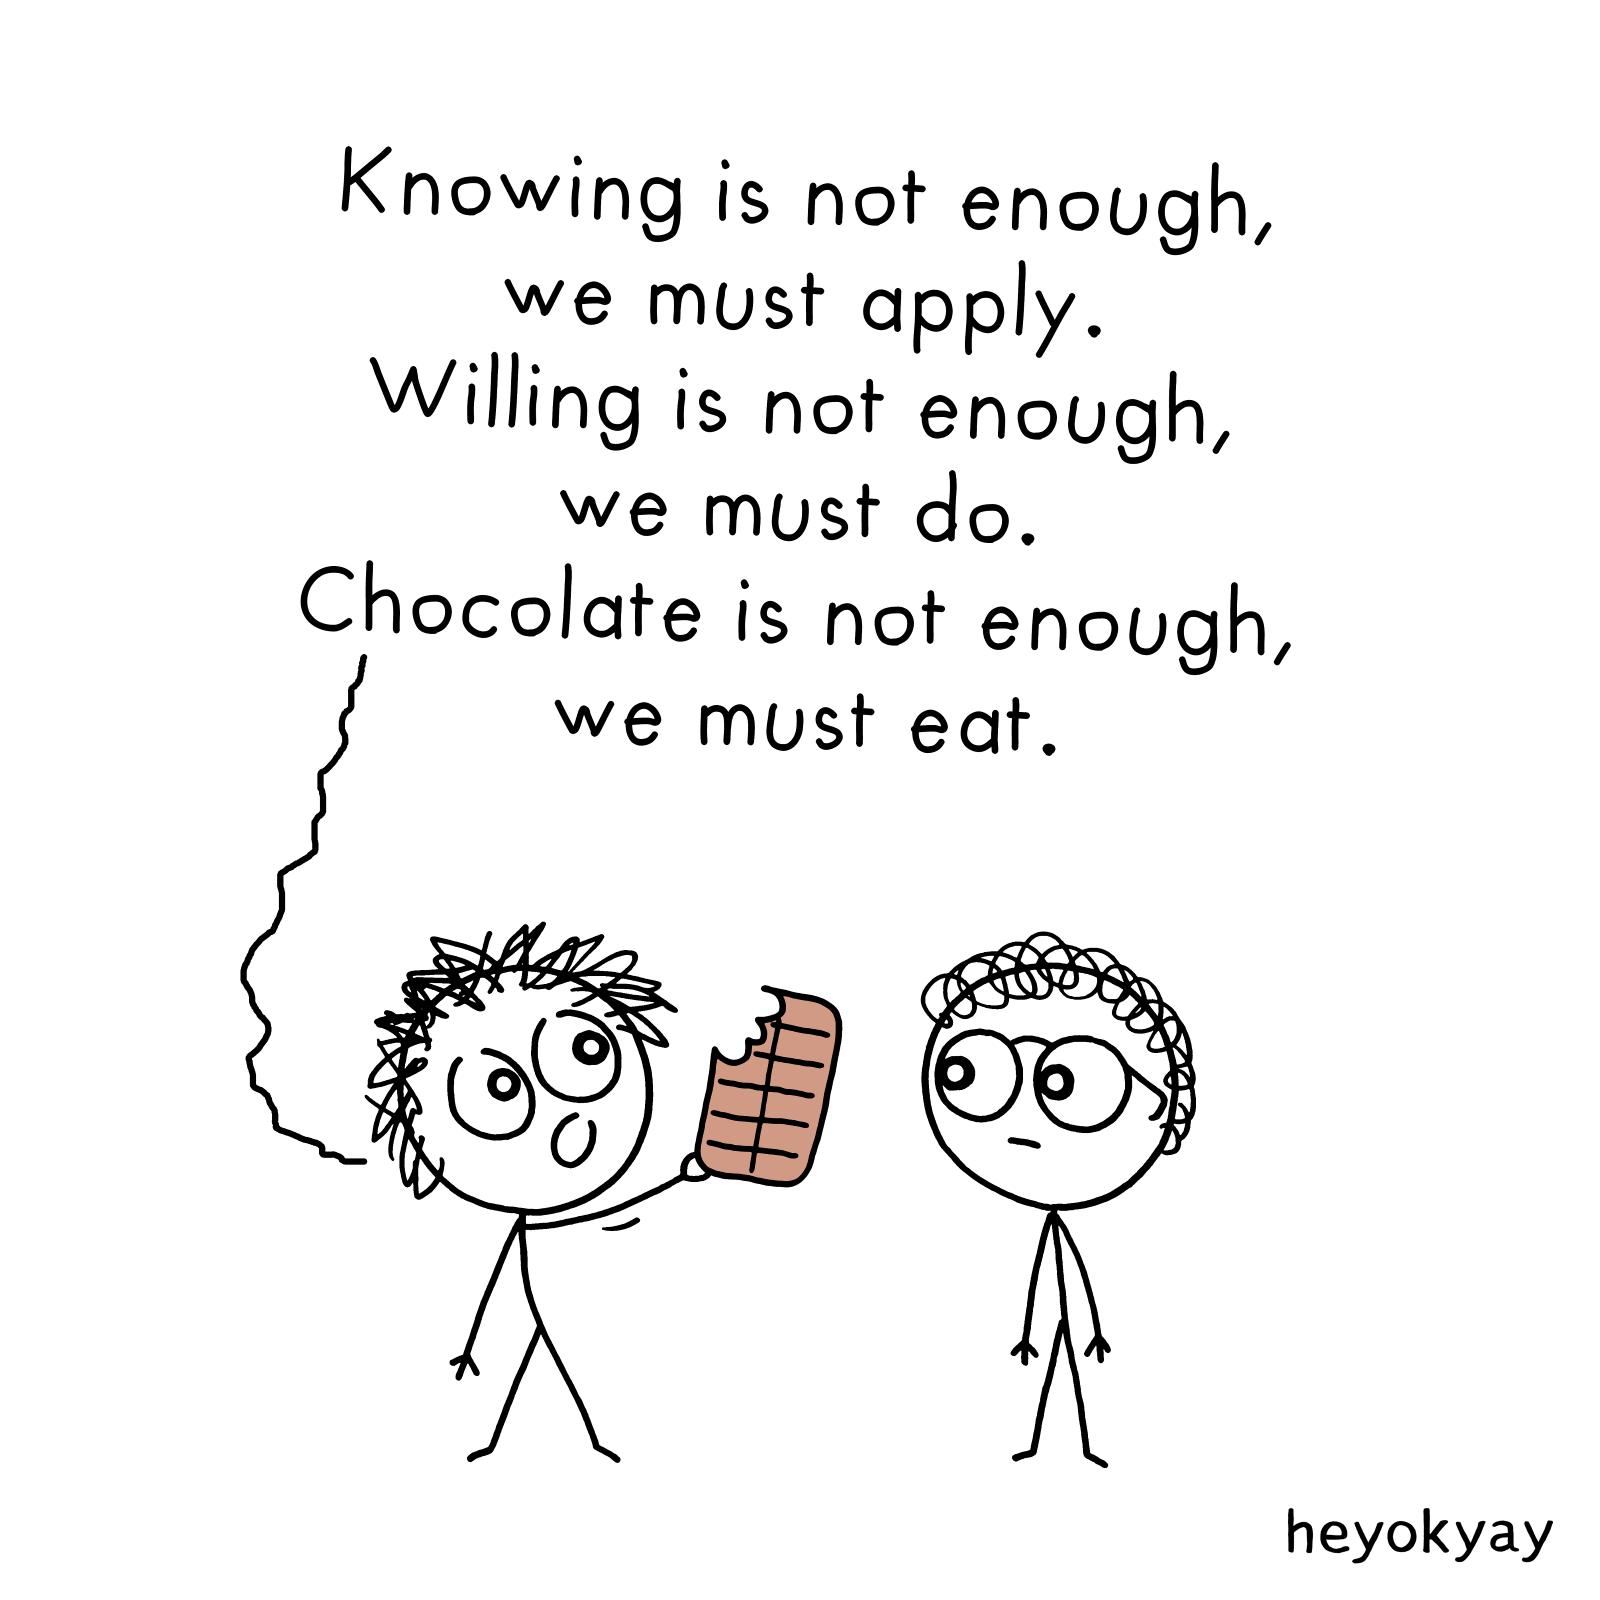 Not Enough heyokyay comic